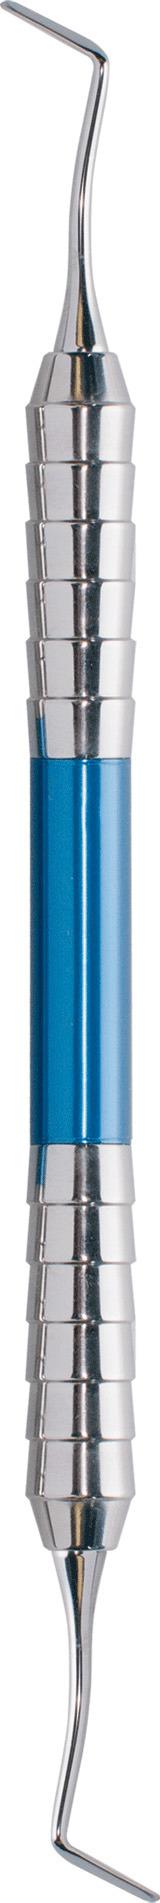 Micro papilla elevator offset xlarge